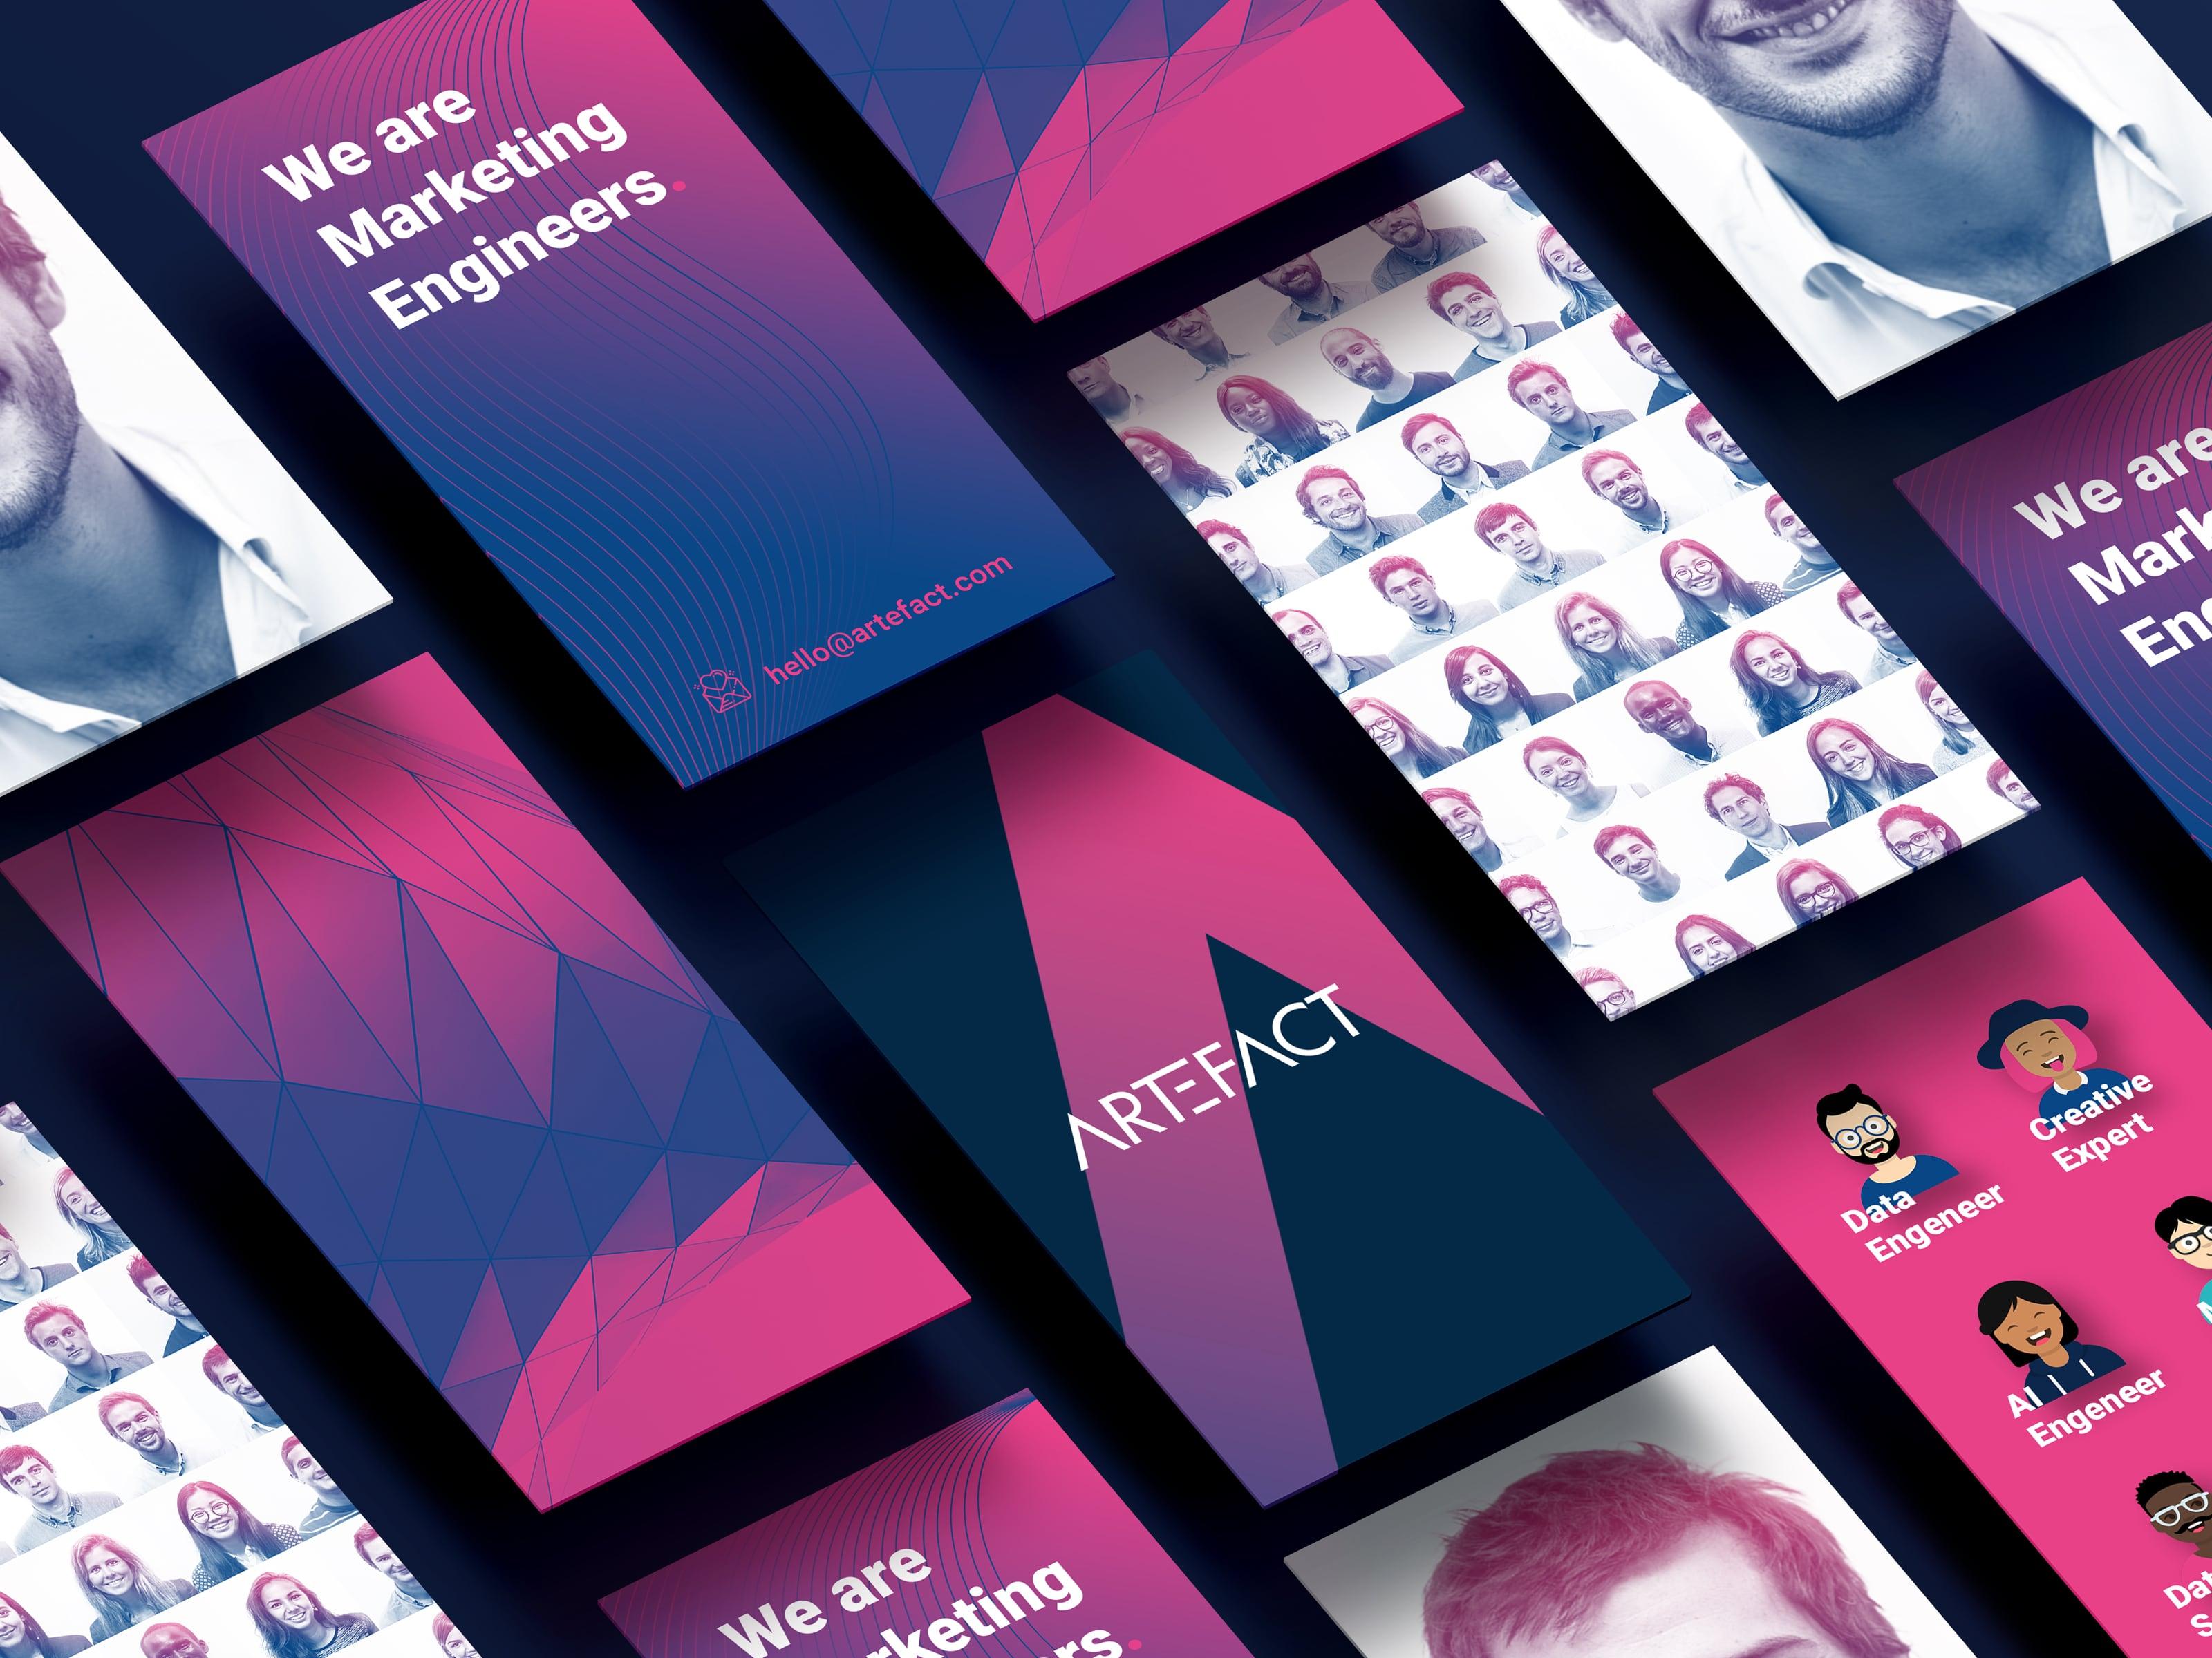 artefact-screens-communication-digital-branding-graphic-design